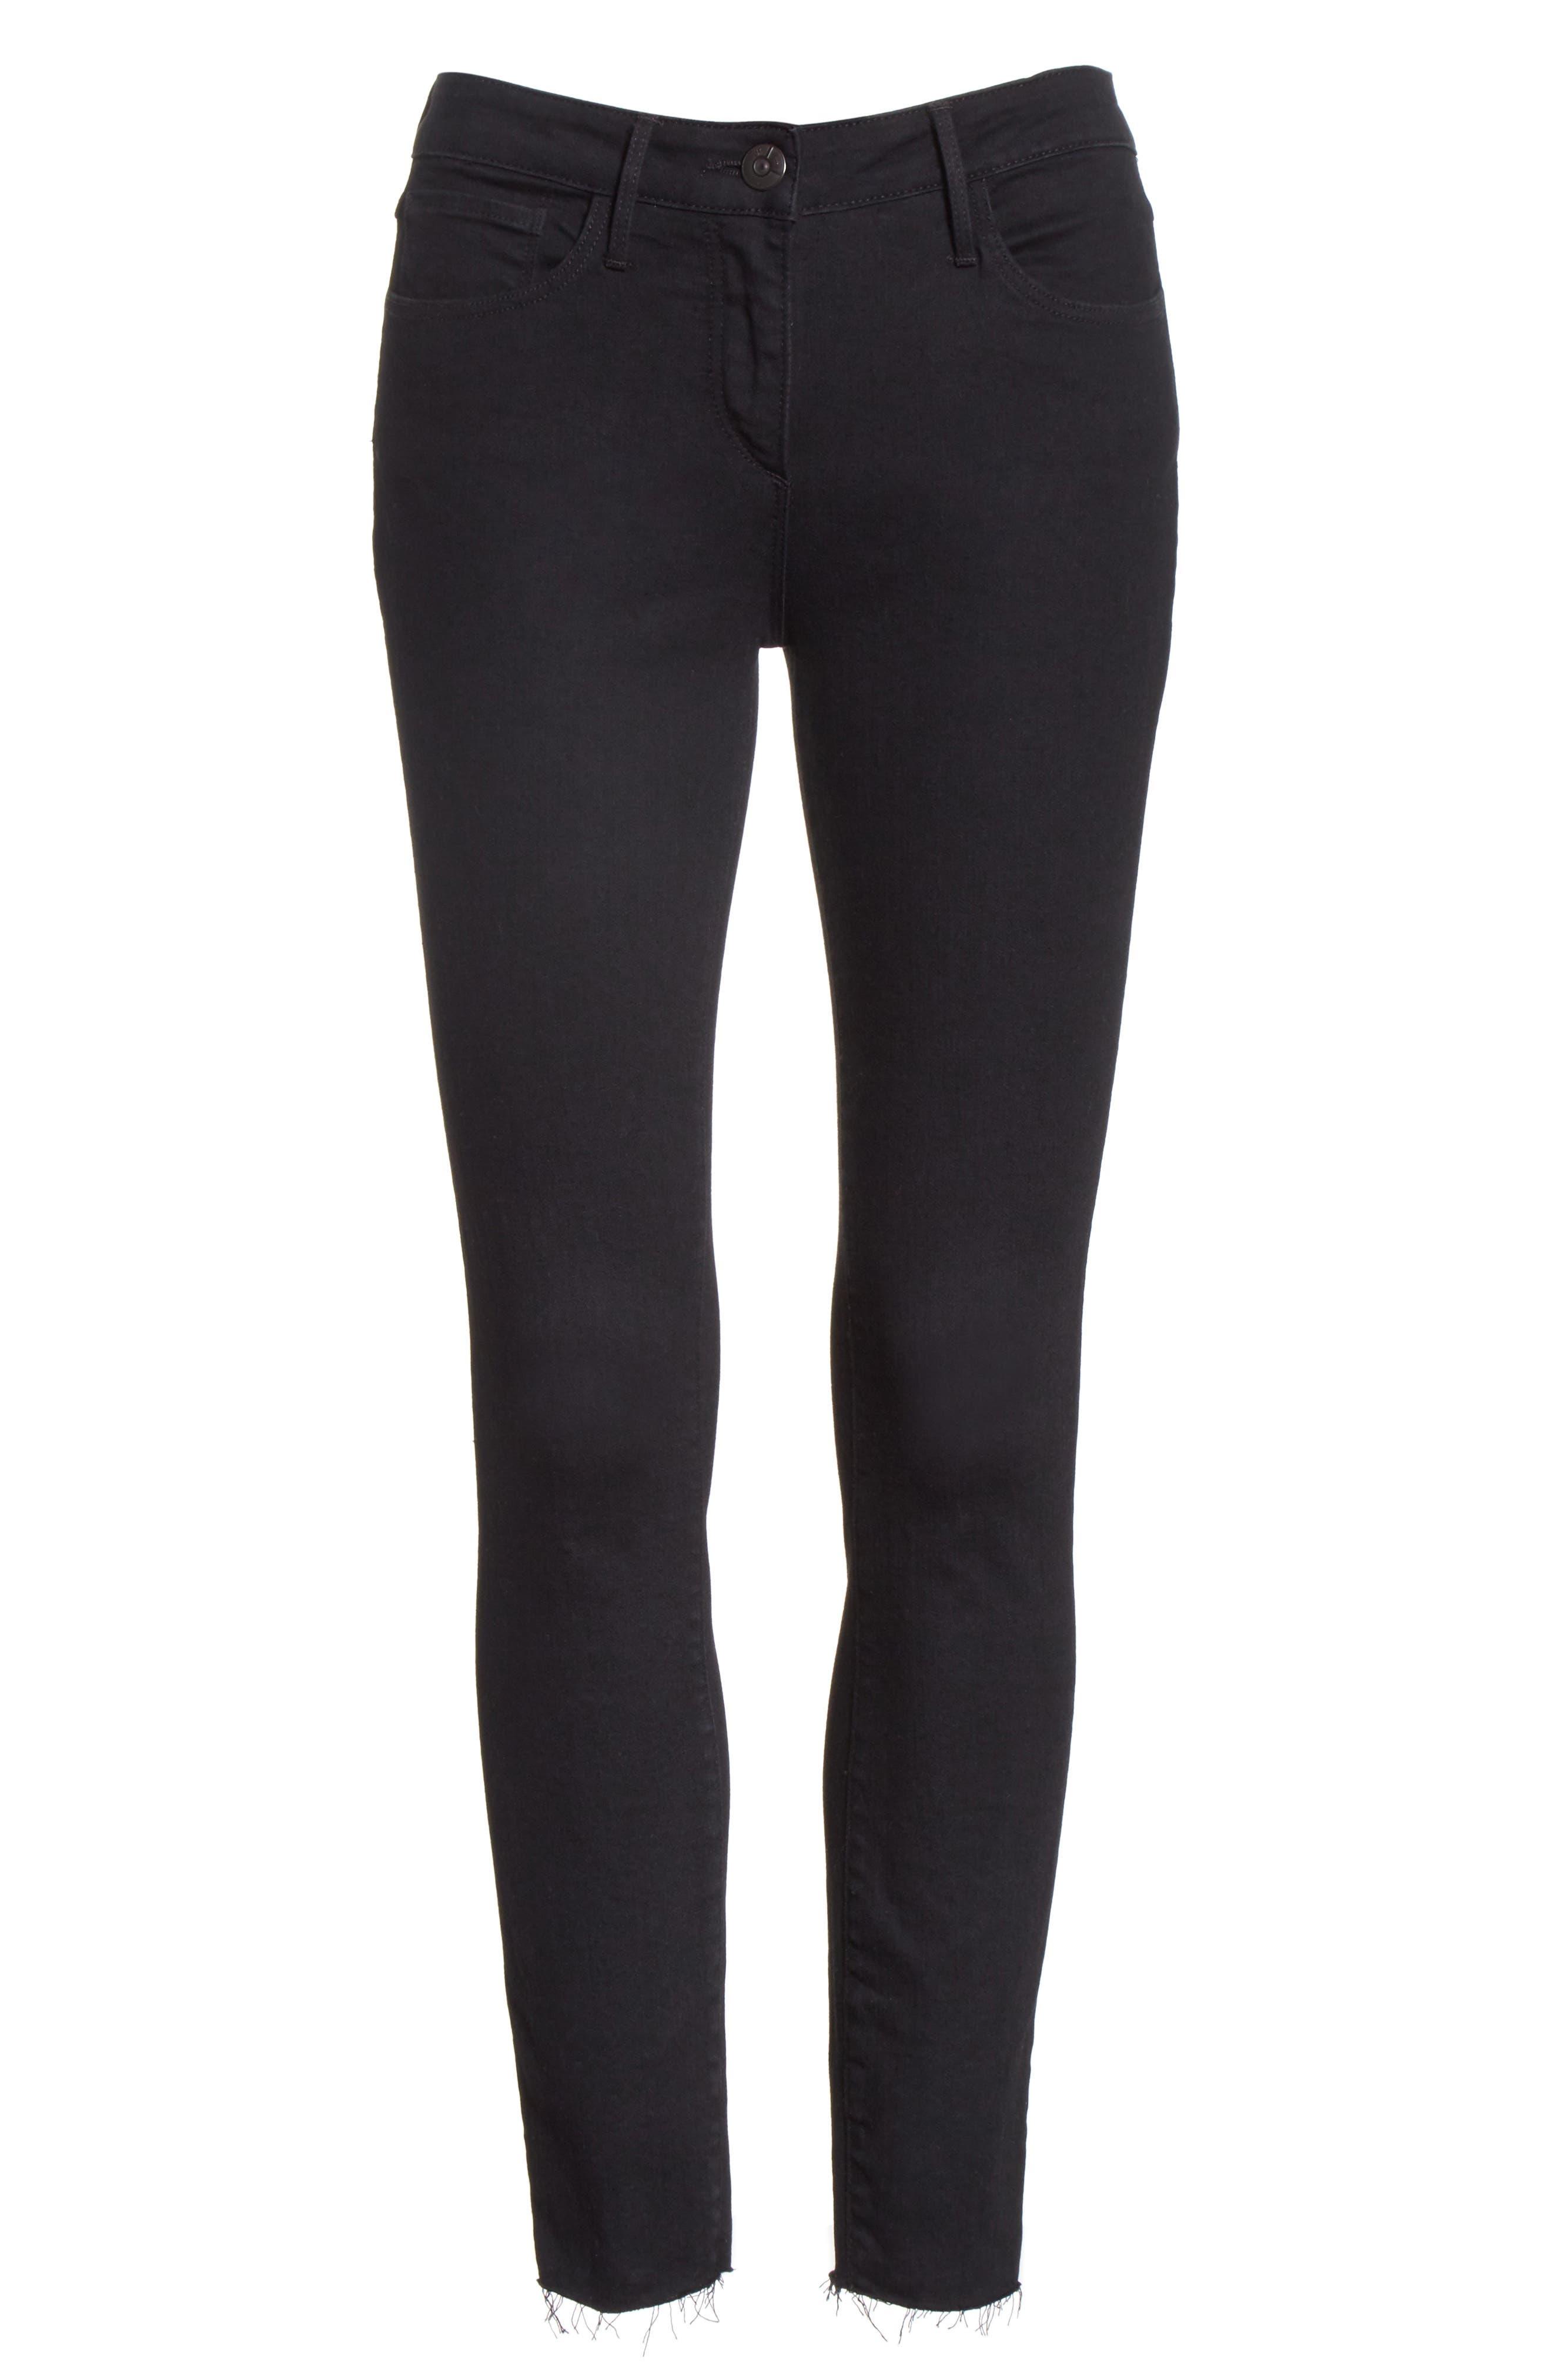 W2 Crop Skinny Jeans,                             Alternate thumbnail 6, color,                             Black Tear